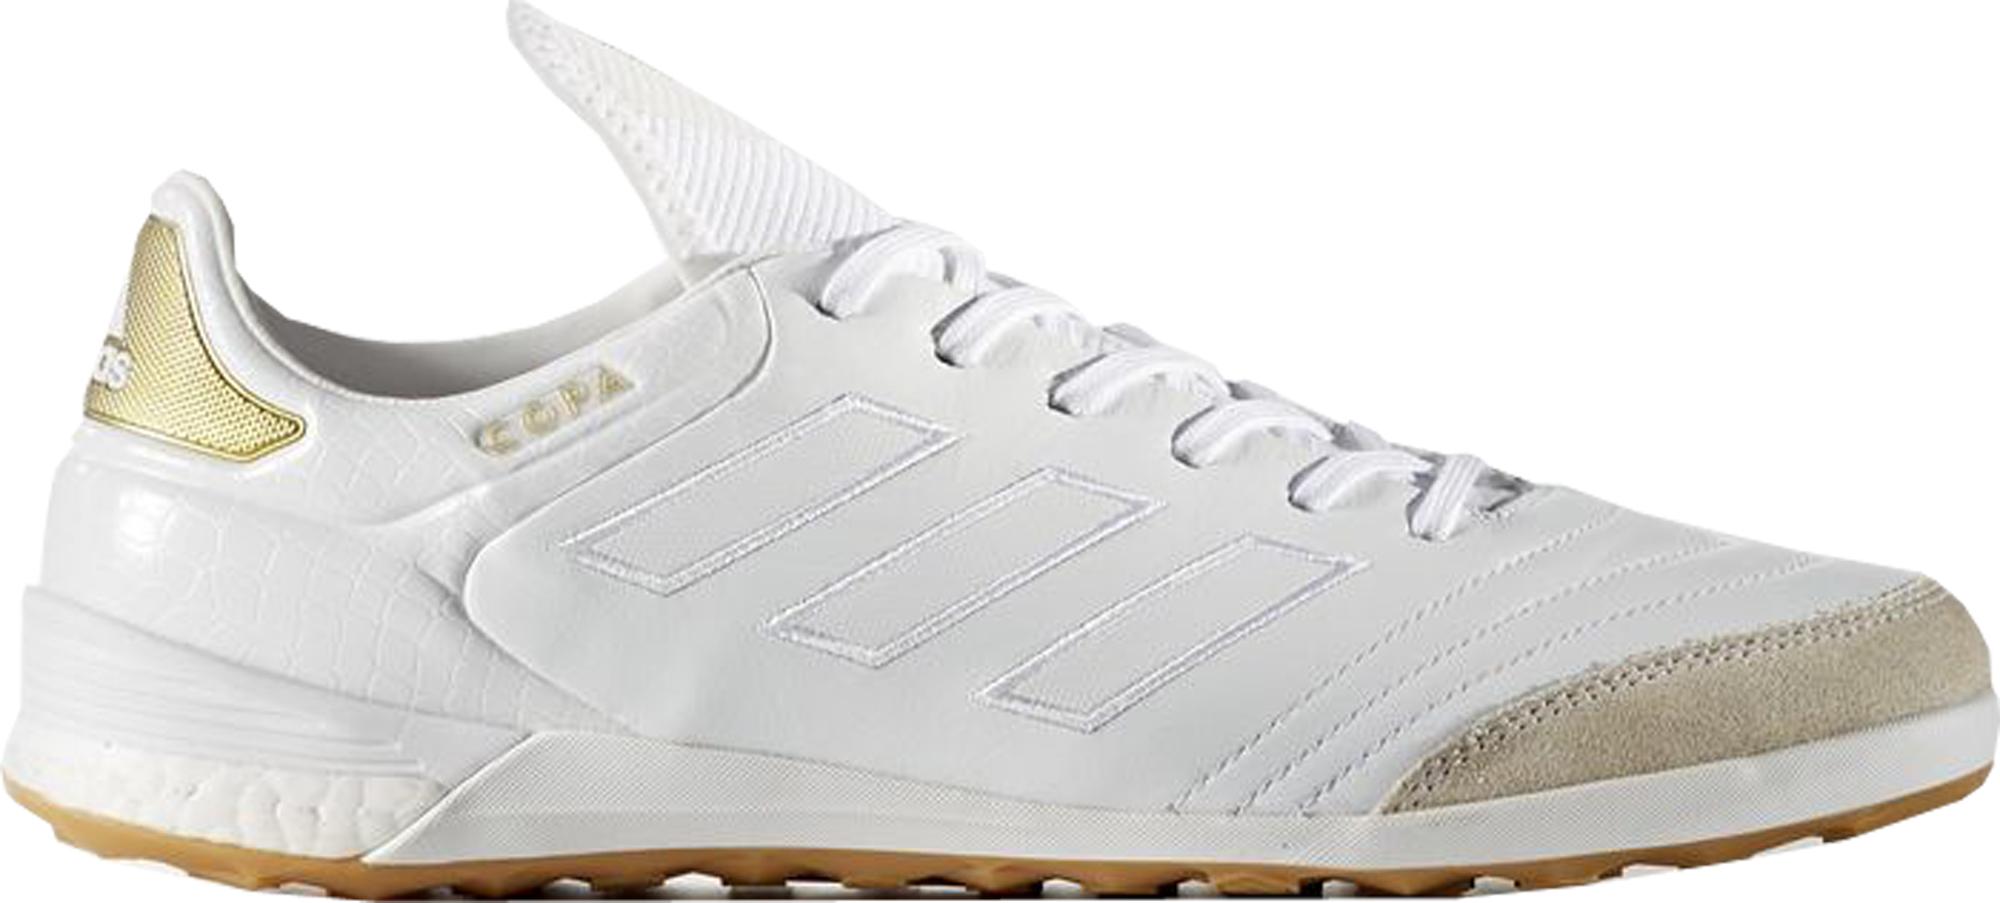 adidas Copa Tango 17.1 Crowning Glory - BA7618